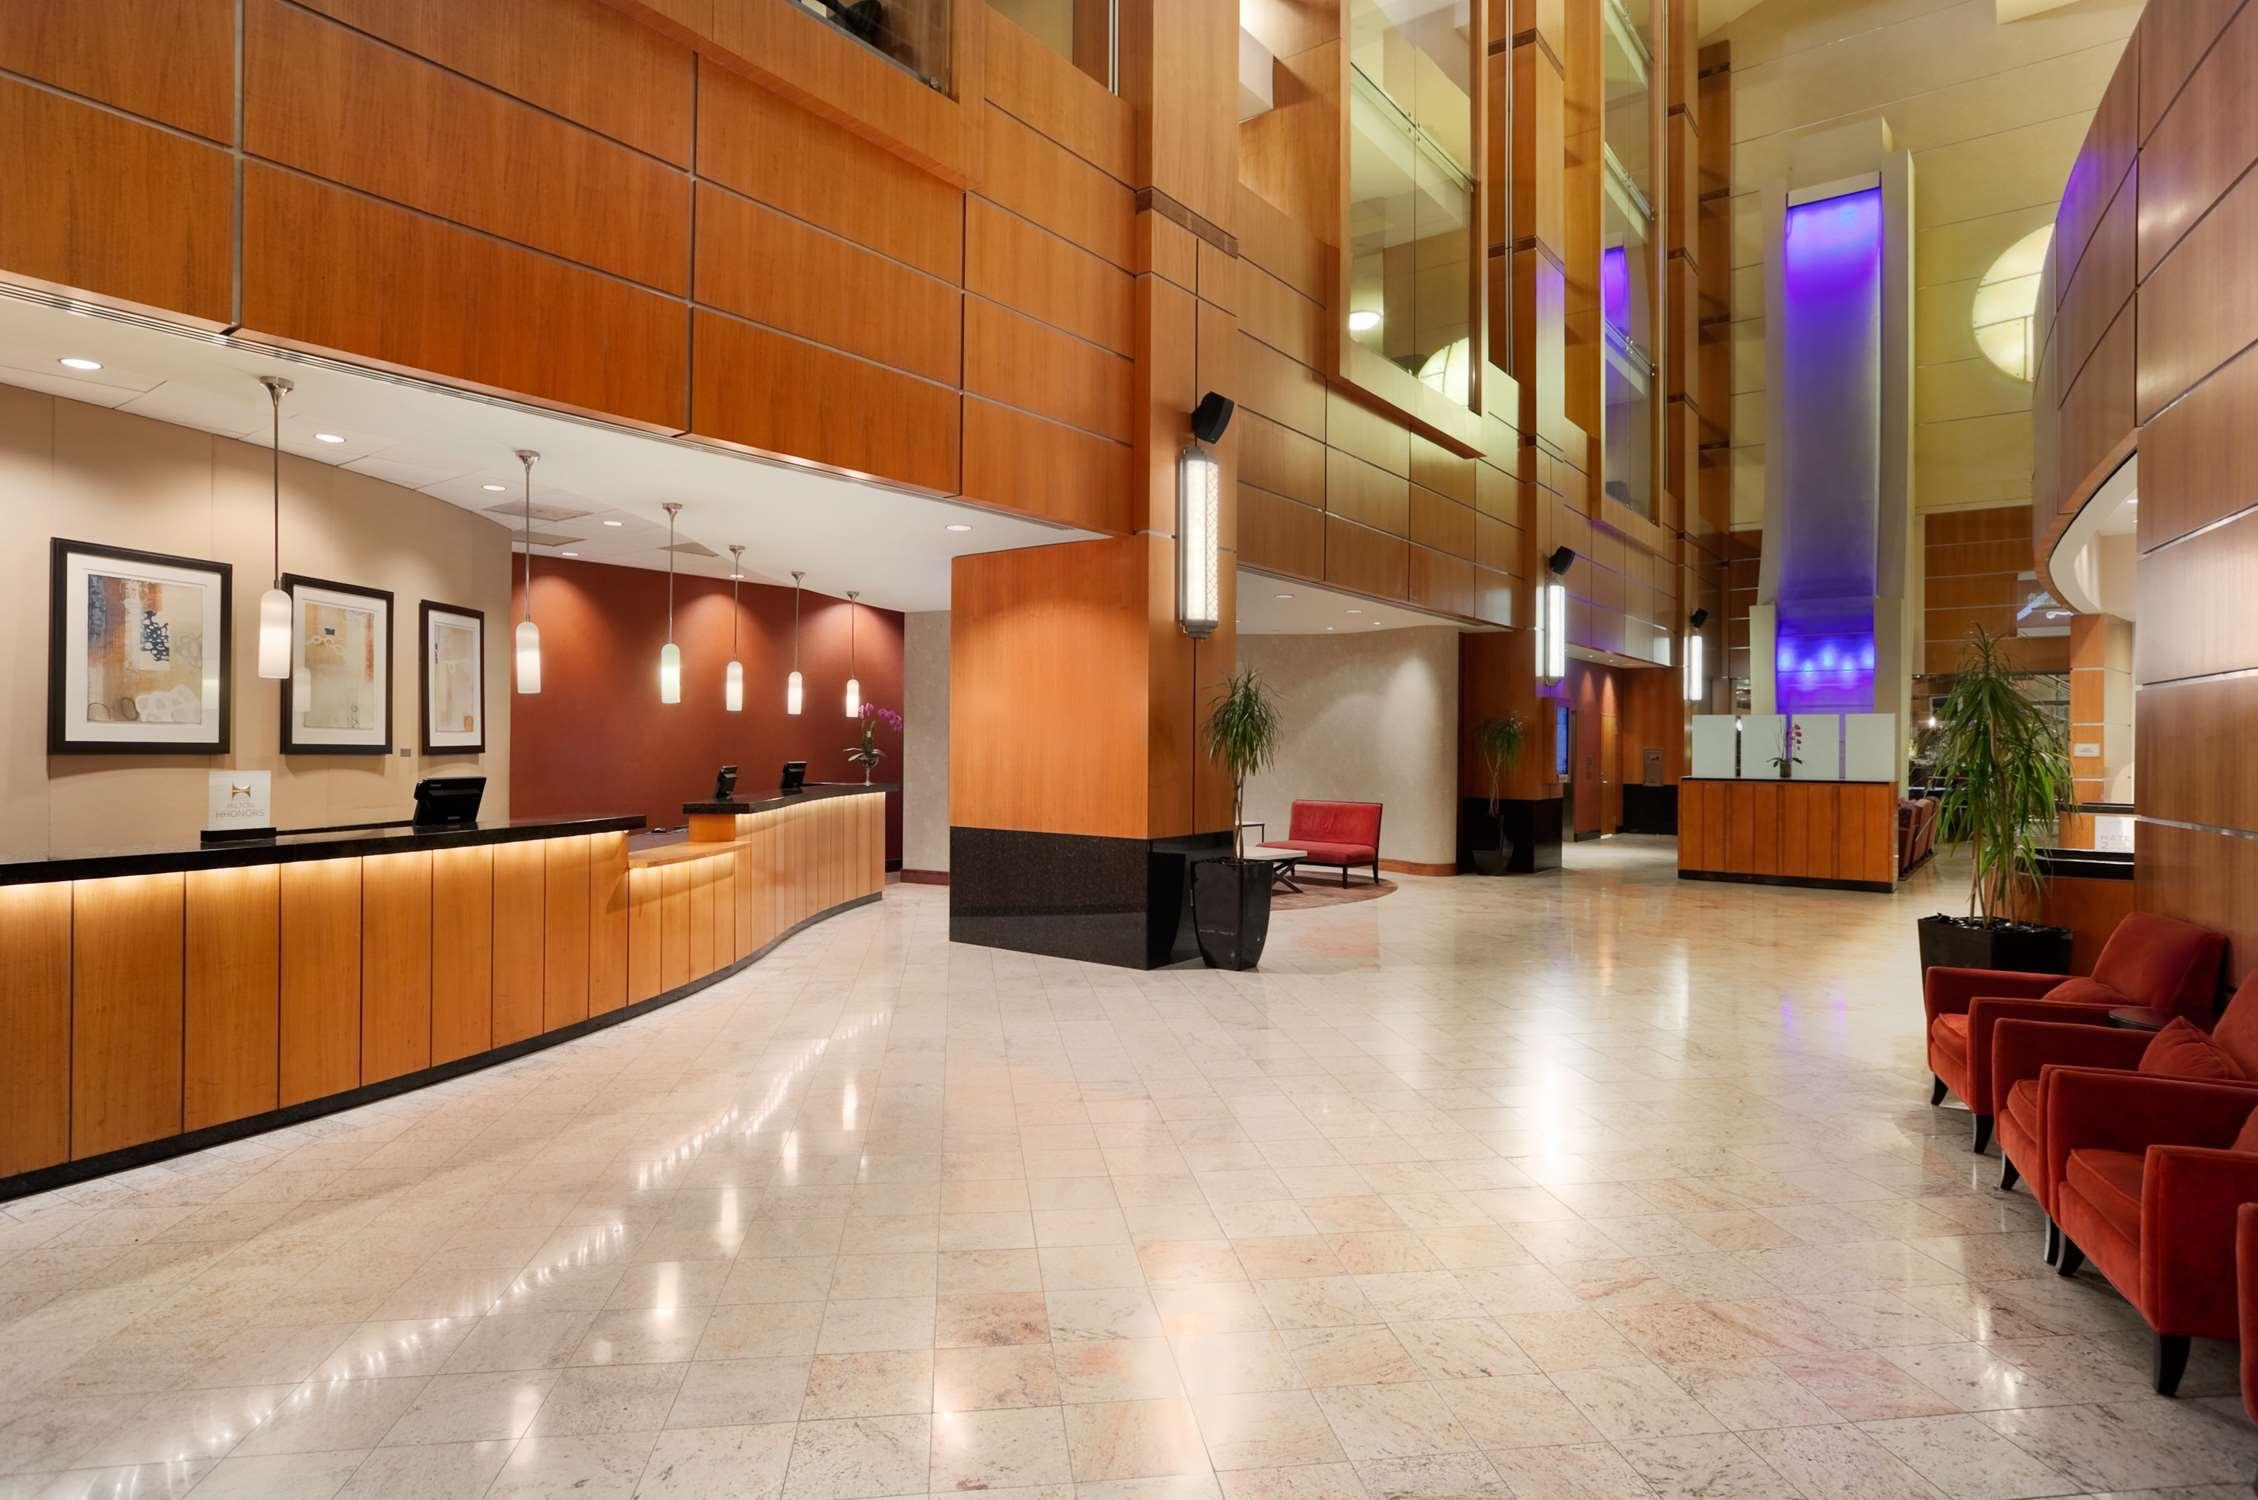 Embassy Suites by Hilton Washington DC Convention Center image 3